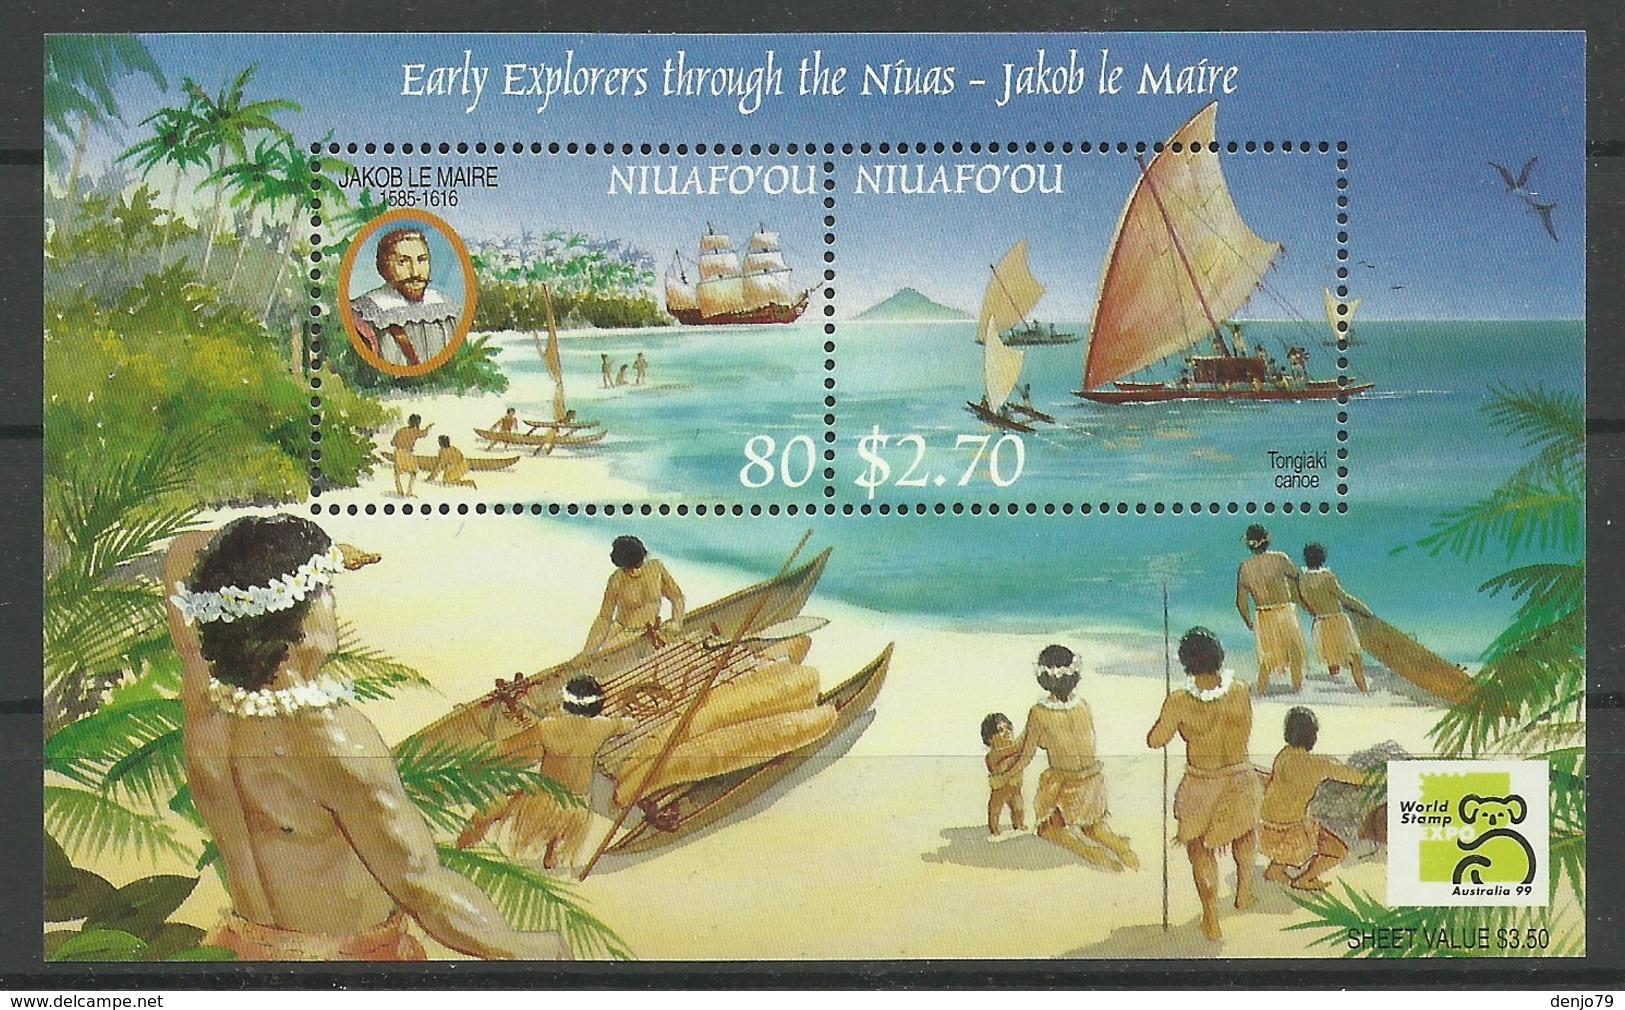 NIUAFO'OU 1999 EARLY EXPLORERS MNH - Postzegels